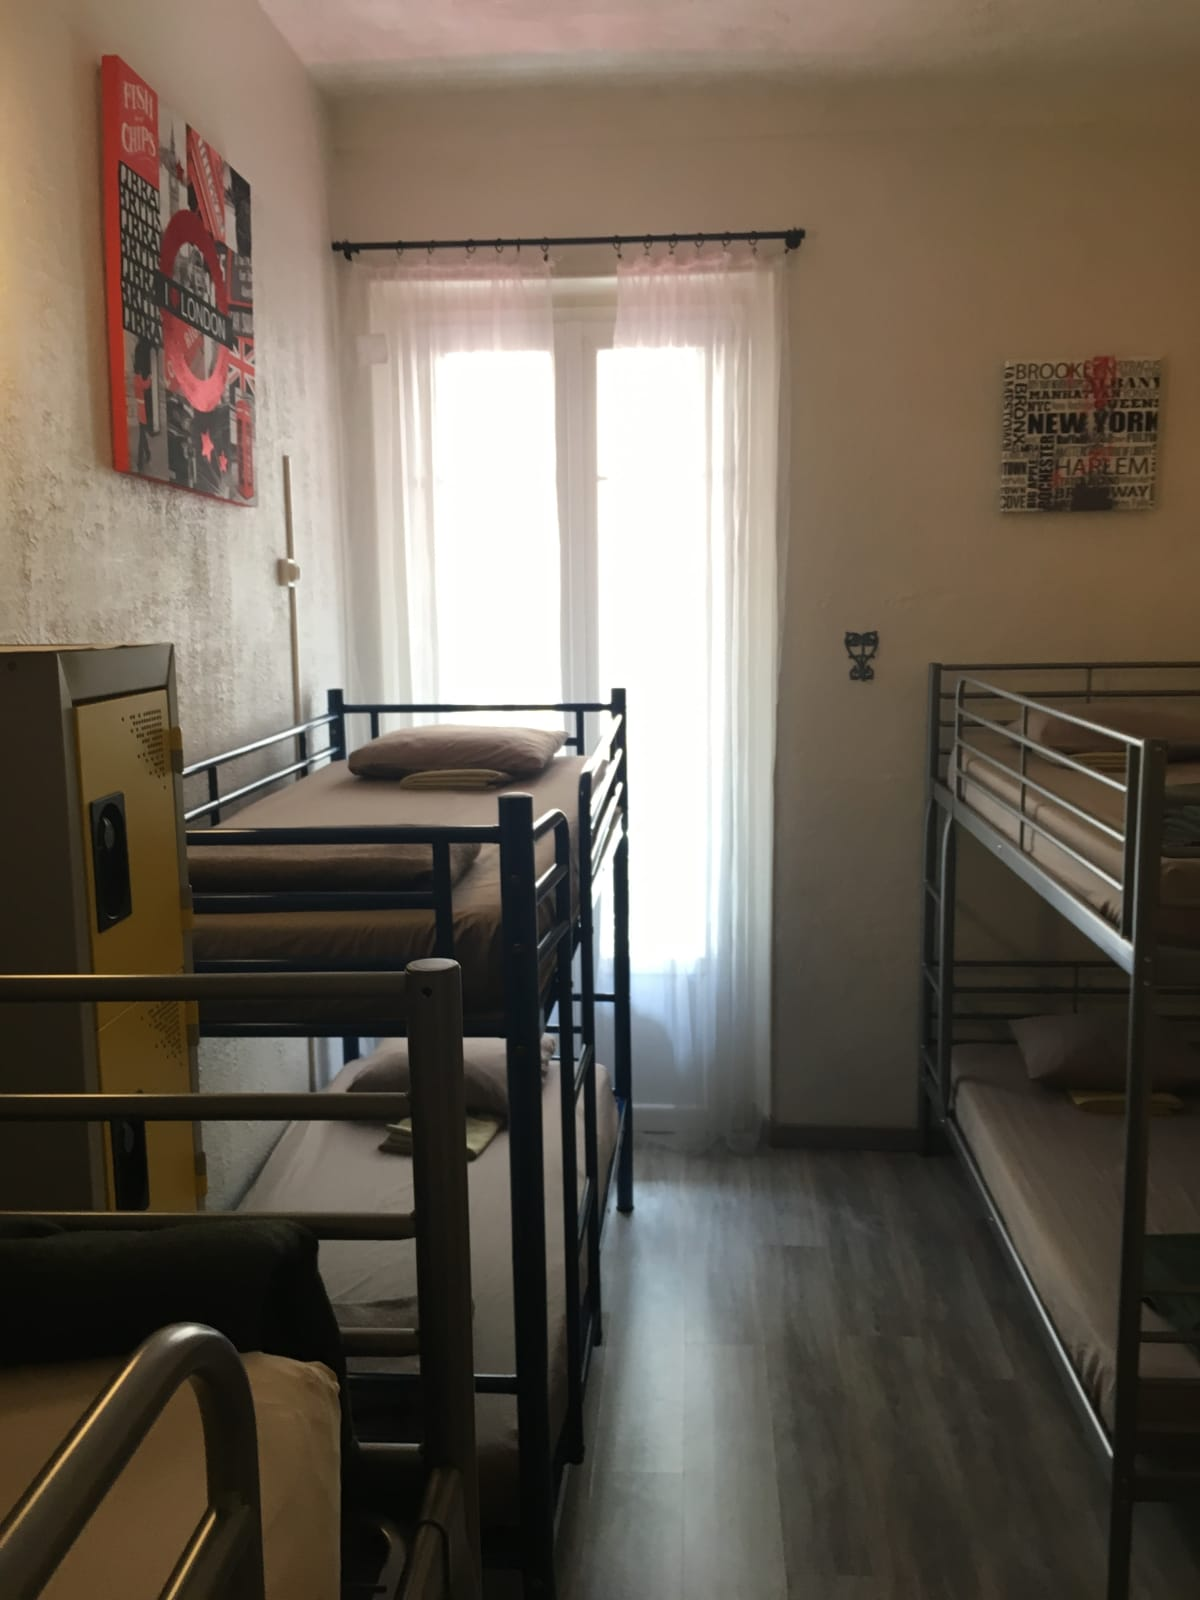 Backpacker's Hostel Chez Patrick, Nice, France hostel